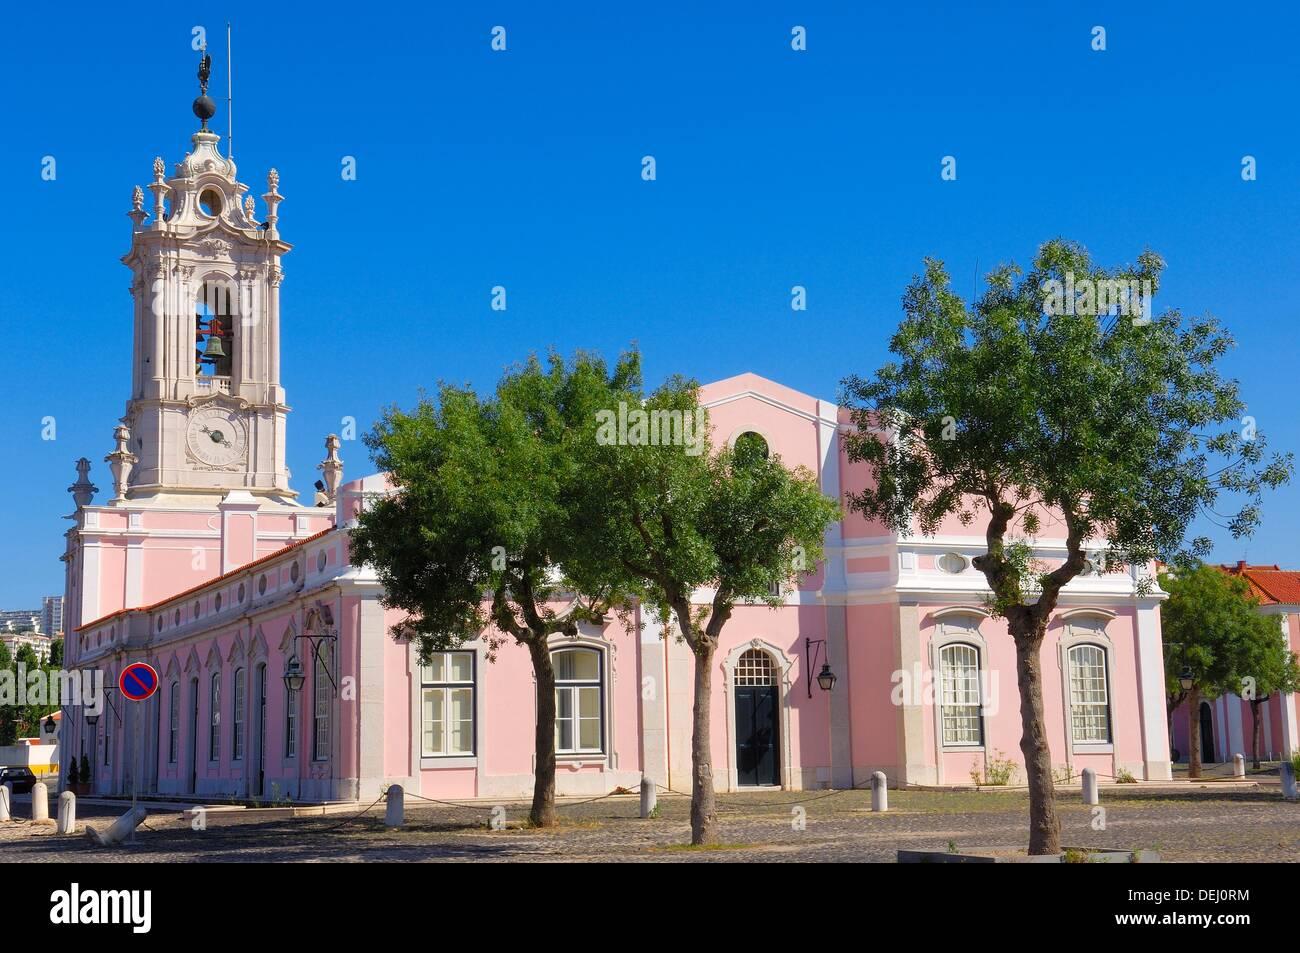 Queluz, Pousada Dona maria, Dona Maria state-run hotel, Lisbon Portugal, Europe. Stock Photo